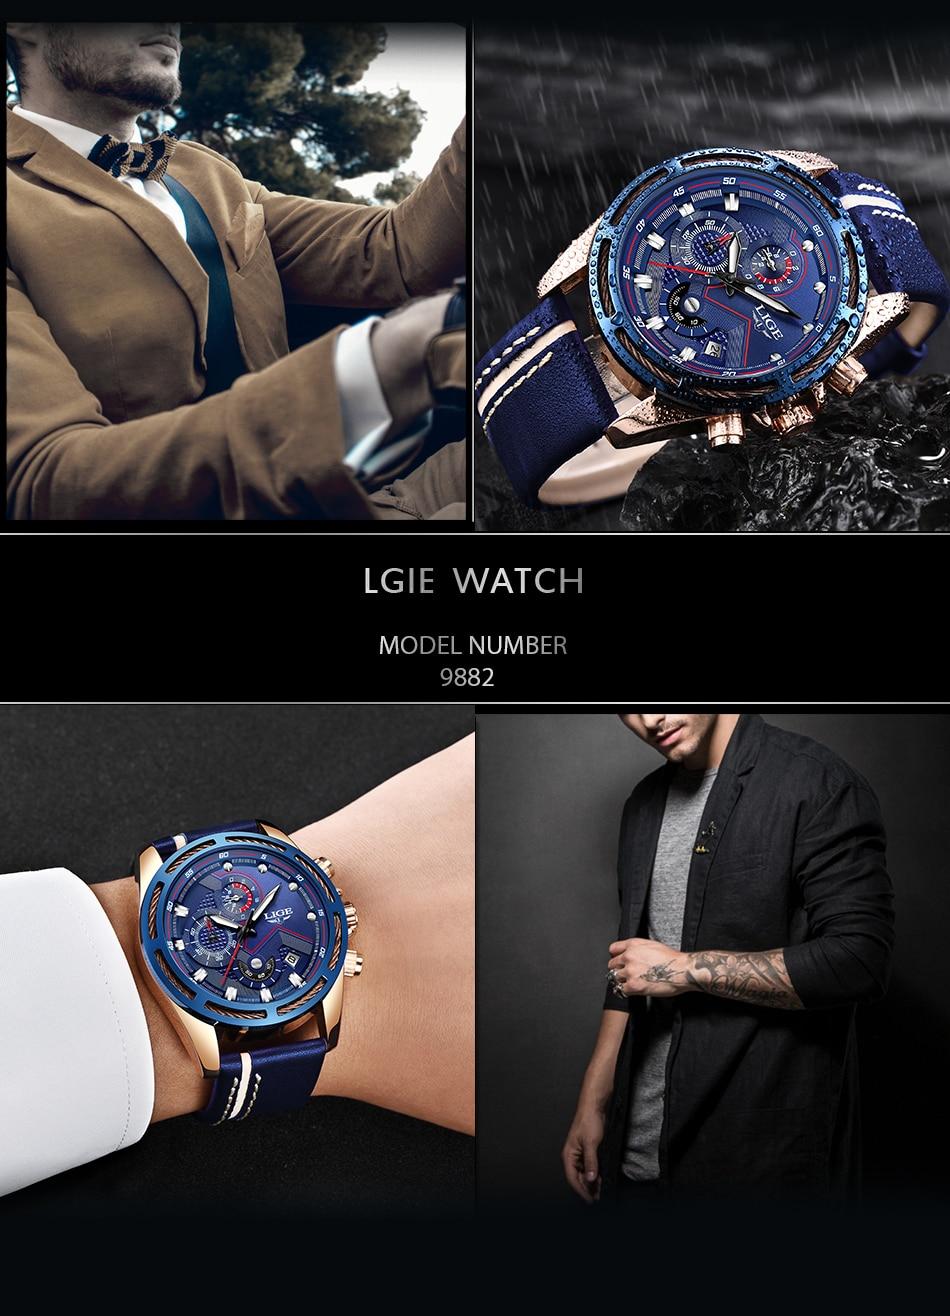 HTB1I9VhXliE3KVjSZFMq6zQhVXaC LIGE Watch Men Fashion Sport Quartz Clock Leather Mens Watches Top Brand Luxury Blue Waterproof Business Watch Relogio Masculino